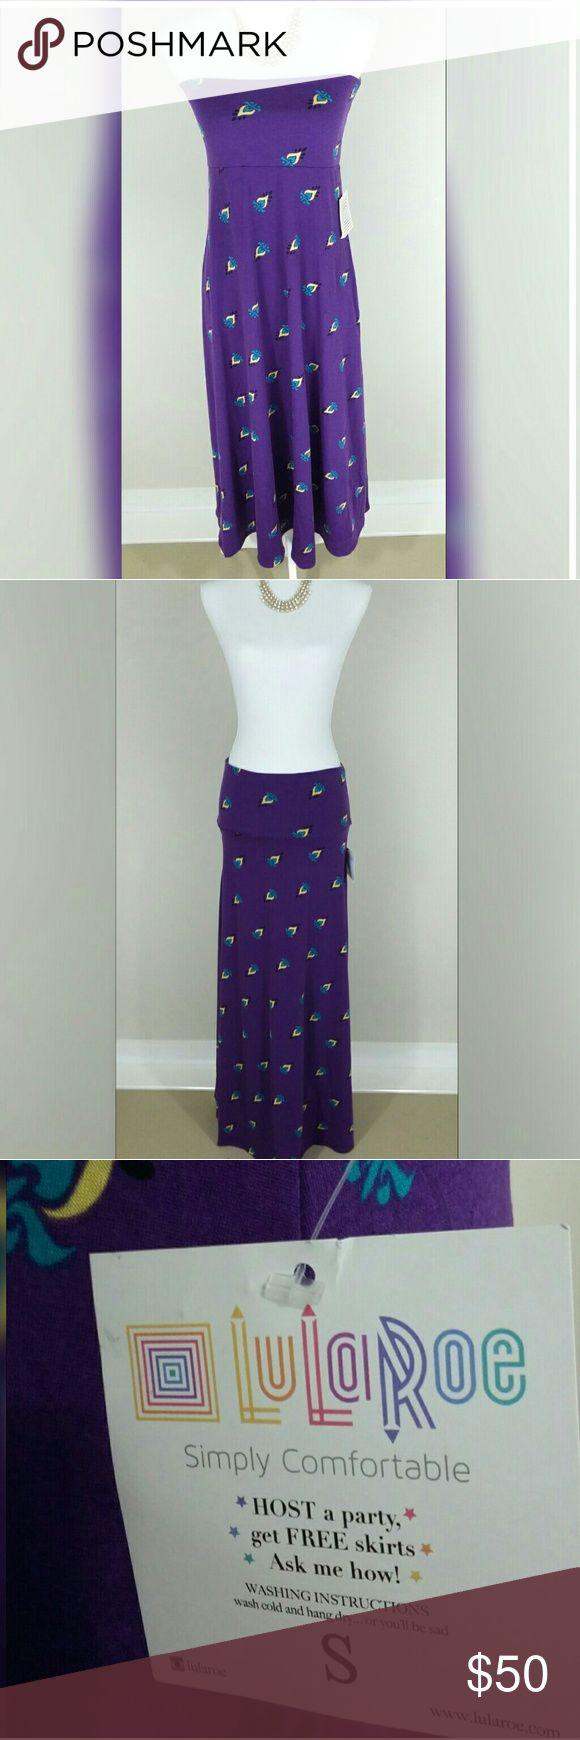 "LULAROE purple maxi skirt/dress NWT, 96% spun polyester, 4% spandex, 15"" flat waist, 42"" long, 53"" bottom wide. LuLaRoe Skirts Maxi"